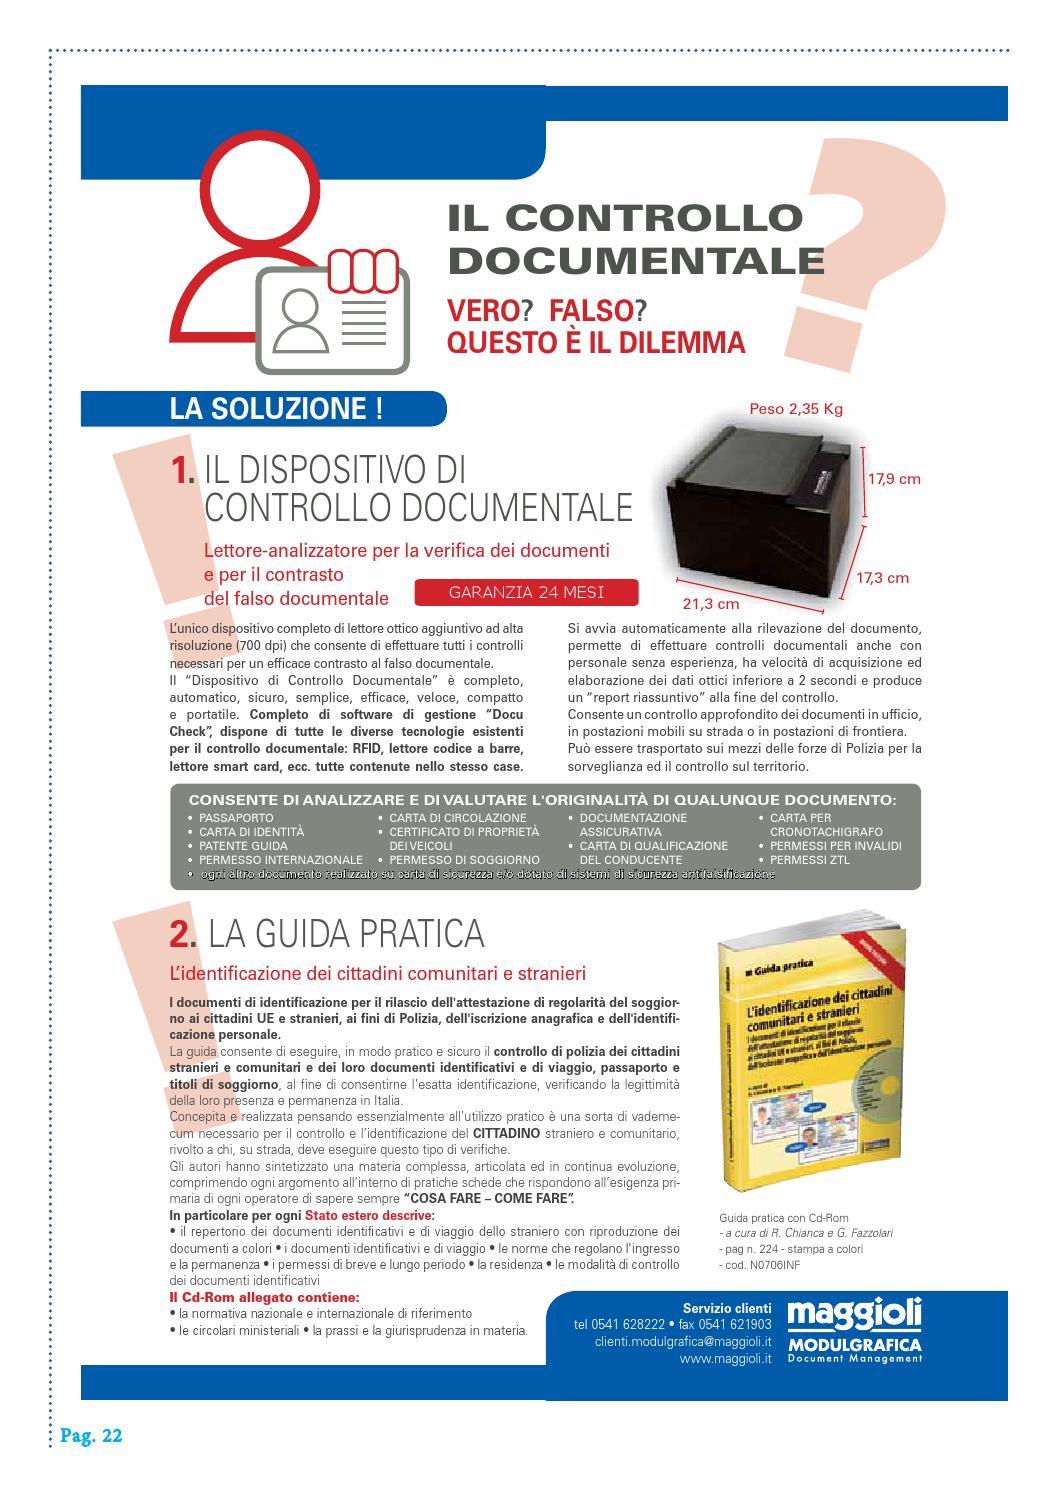 Notiziario ANUSCA 2015 - 02 Febbraio by ANUSCA - issuu